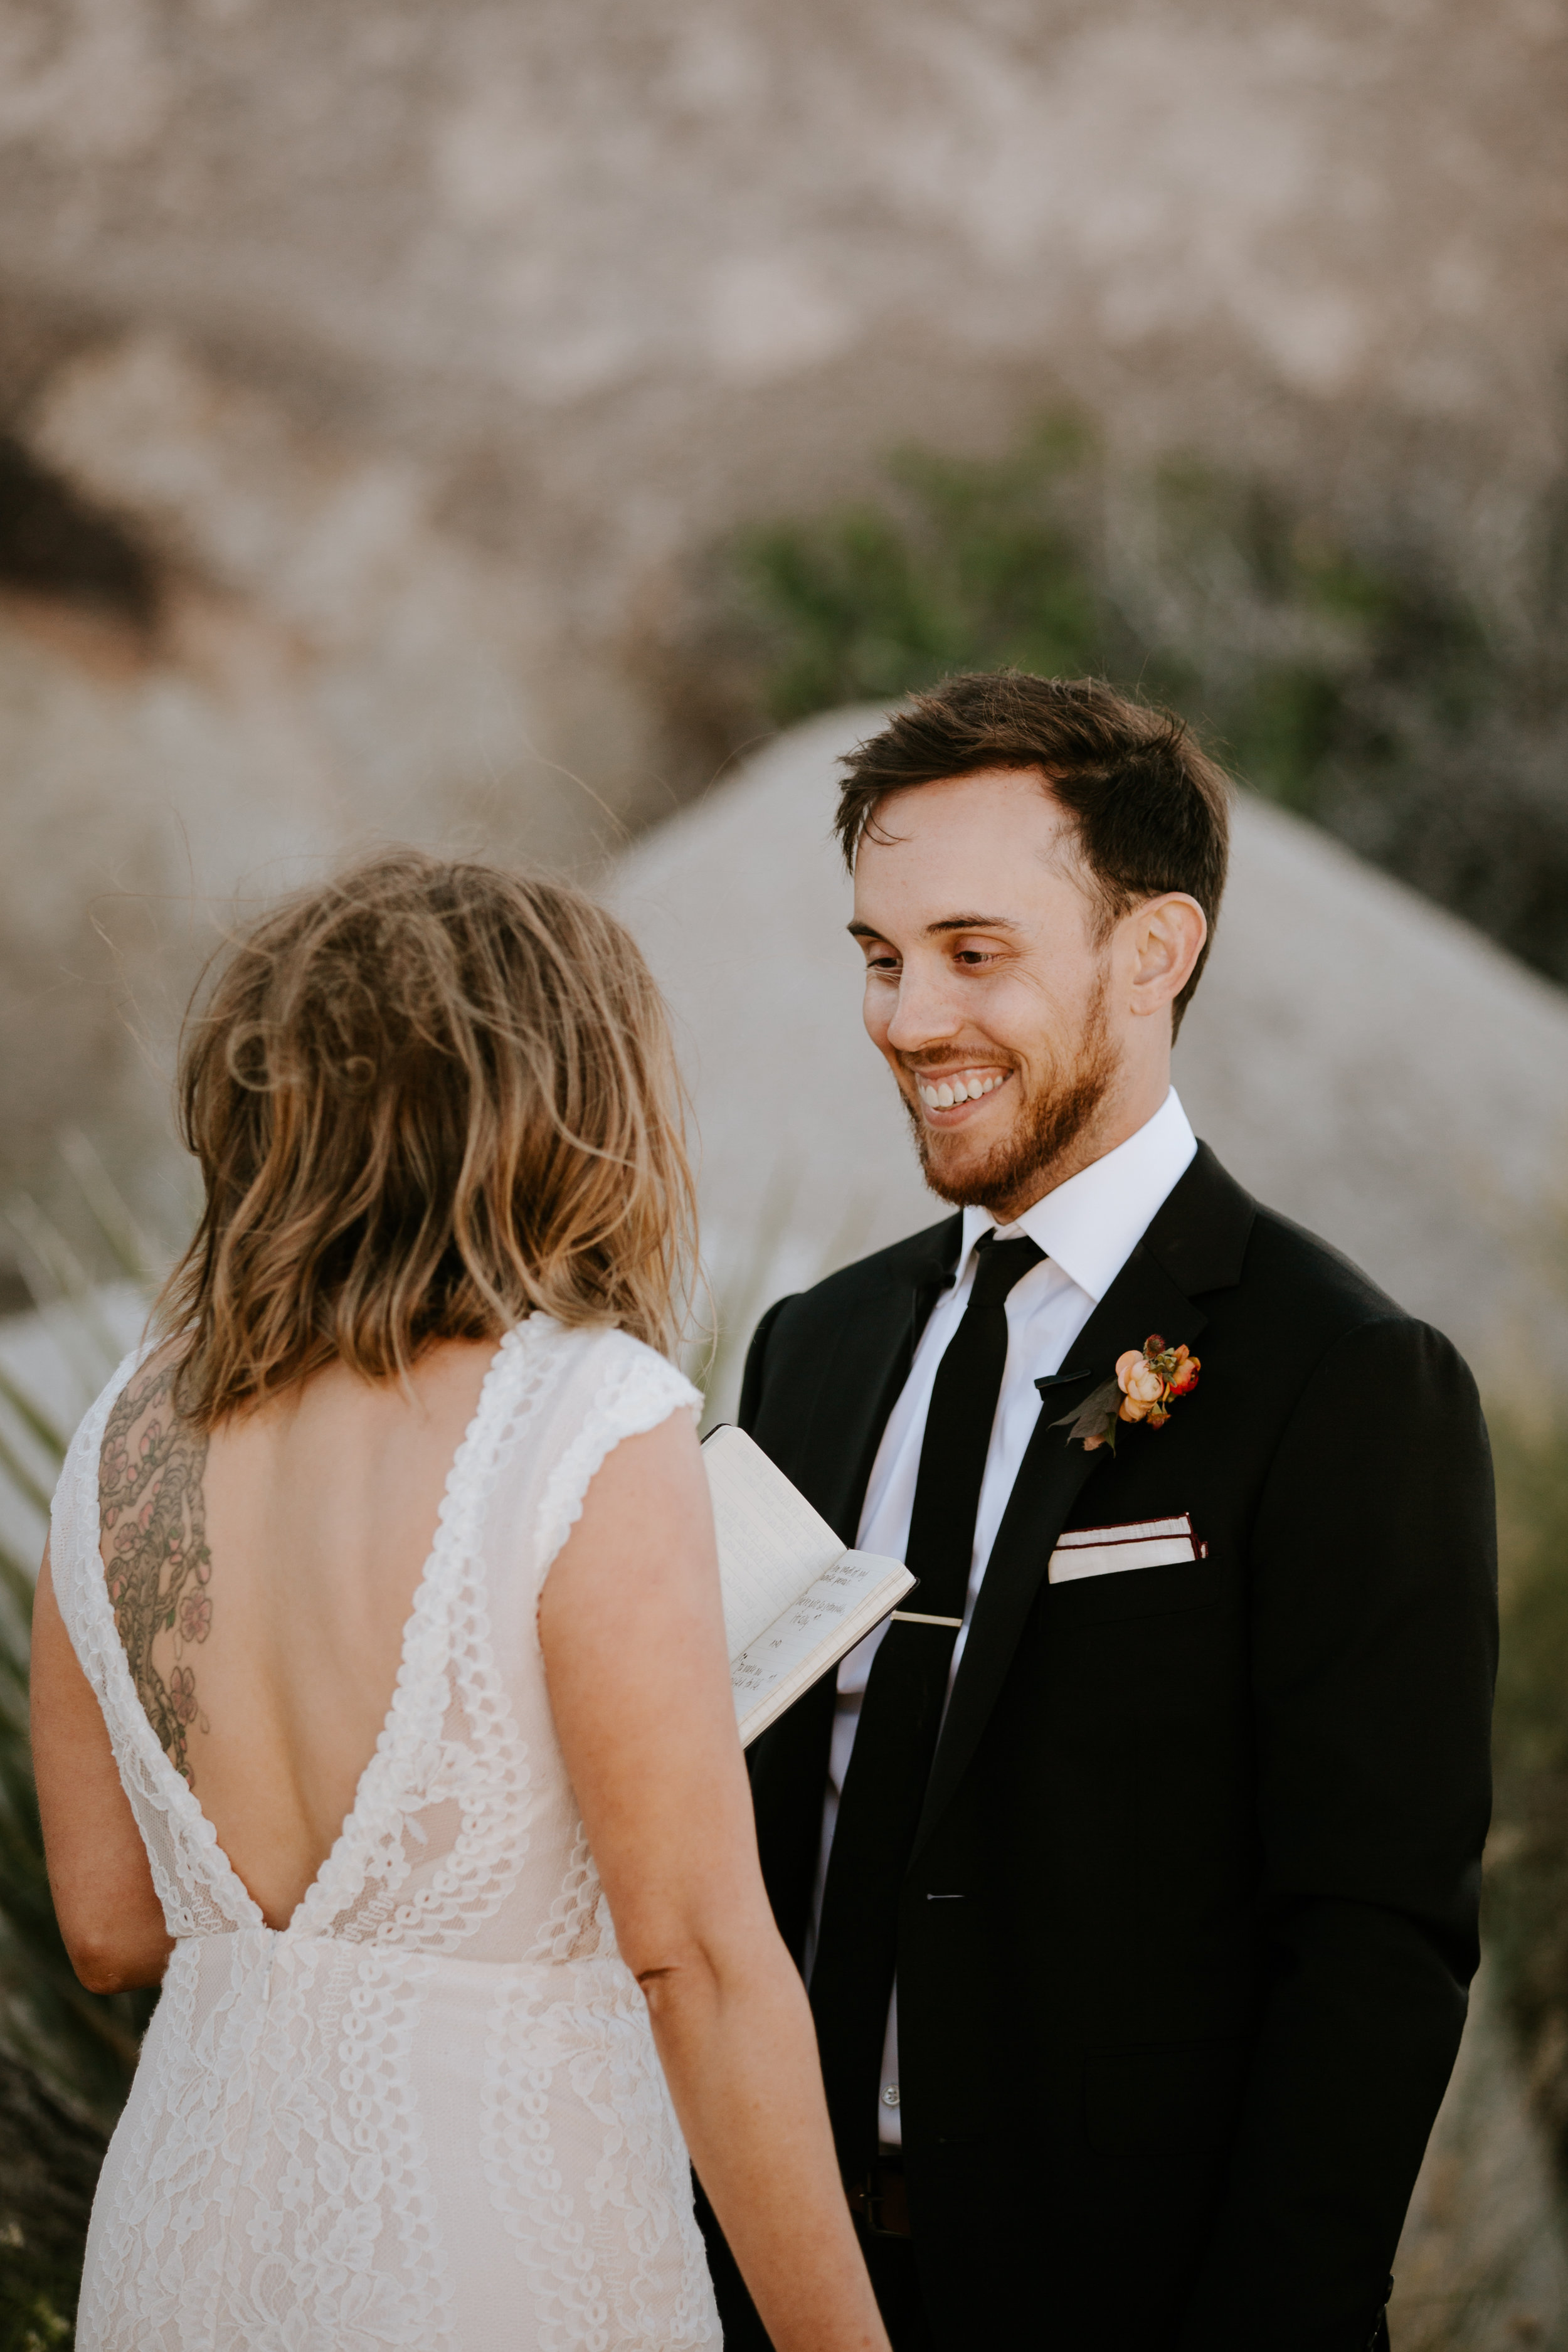 2019-05-26_Callie-Evan_Wedding_Joshua Tree_Paige Nelson_PREVIEWS HR-32.jpg